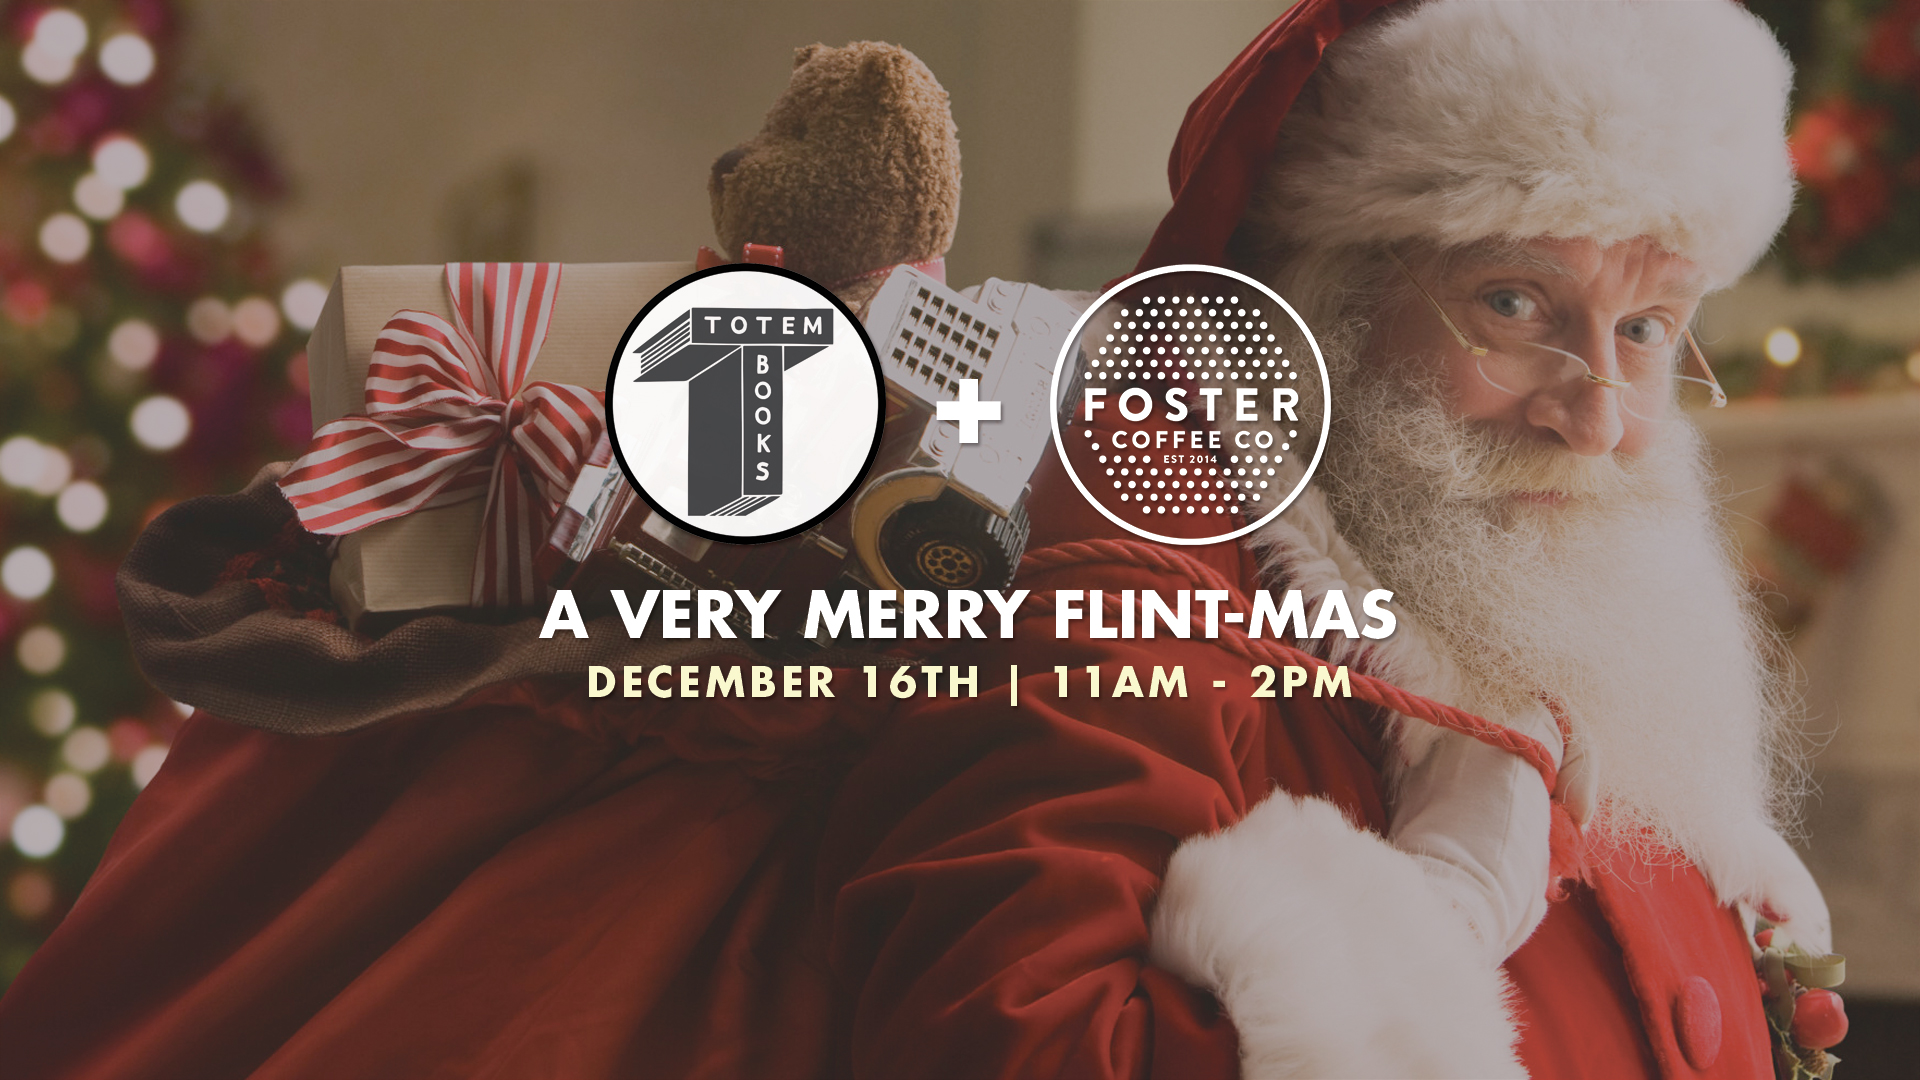 Christmas_in_Flint_cover12.16.17.jpg